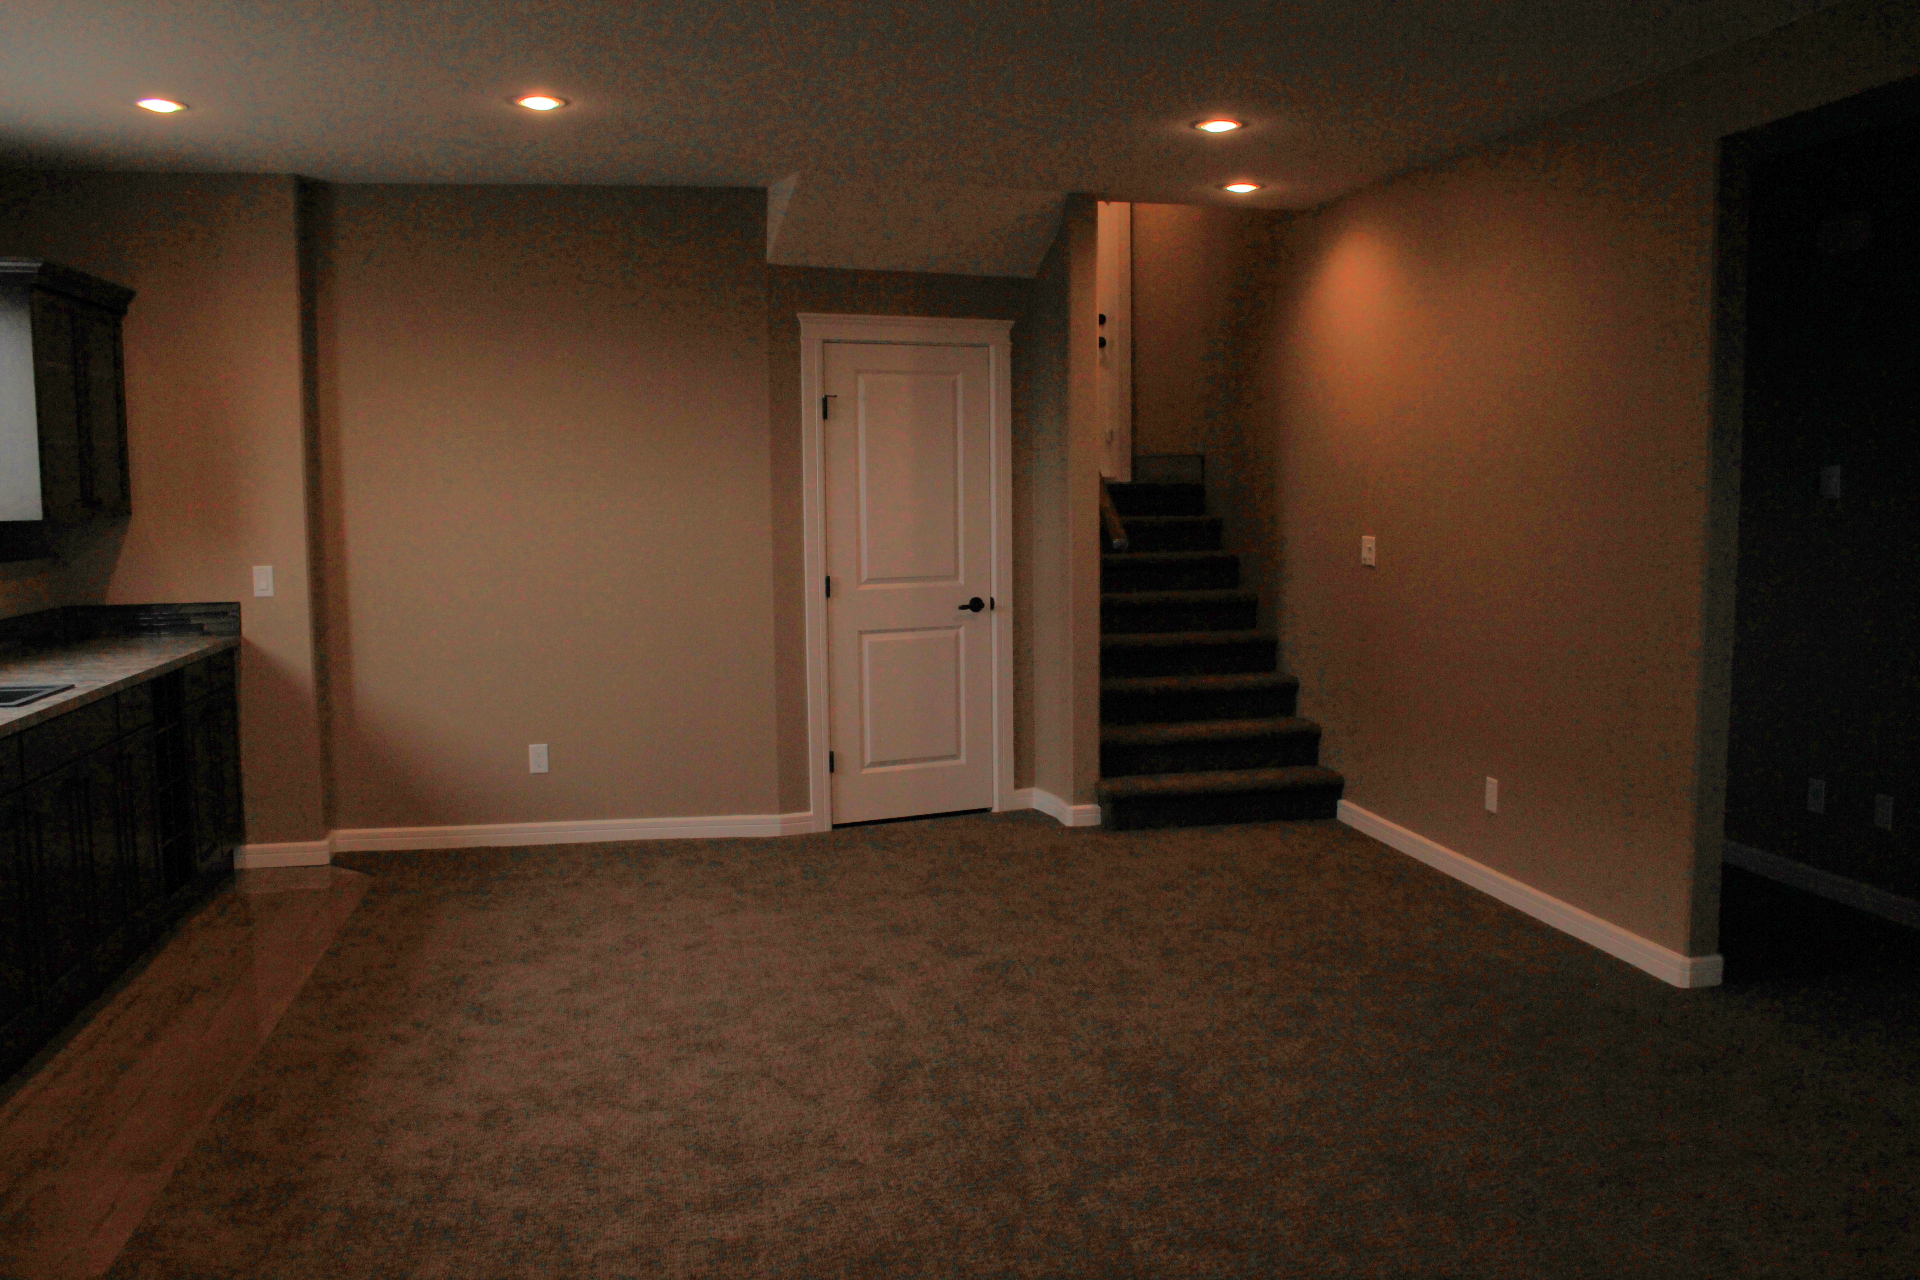 2191 basement